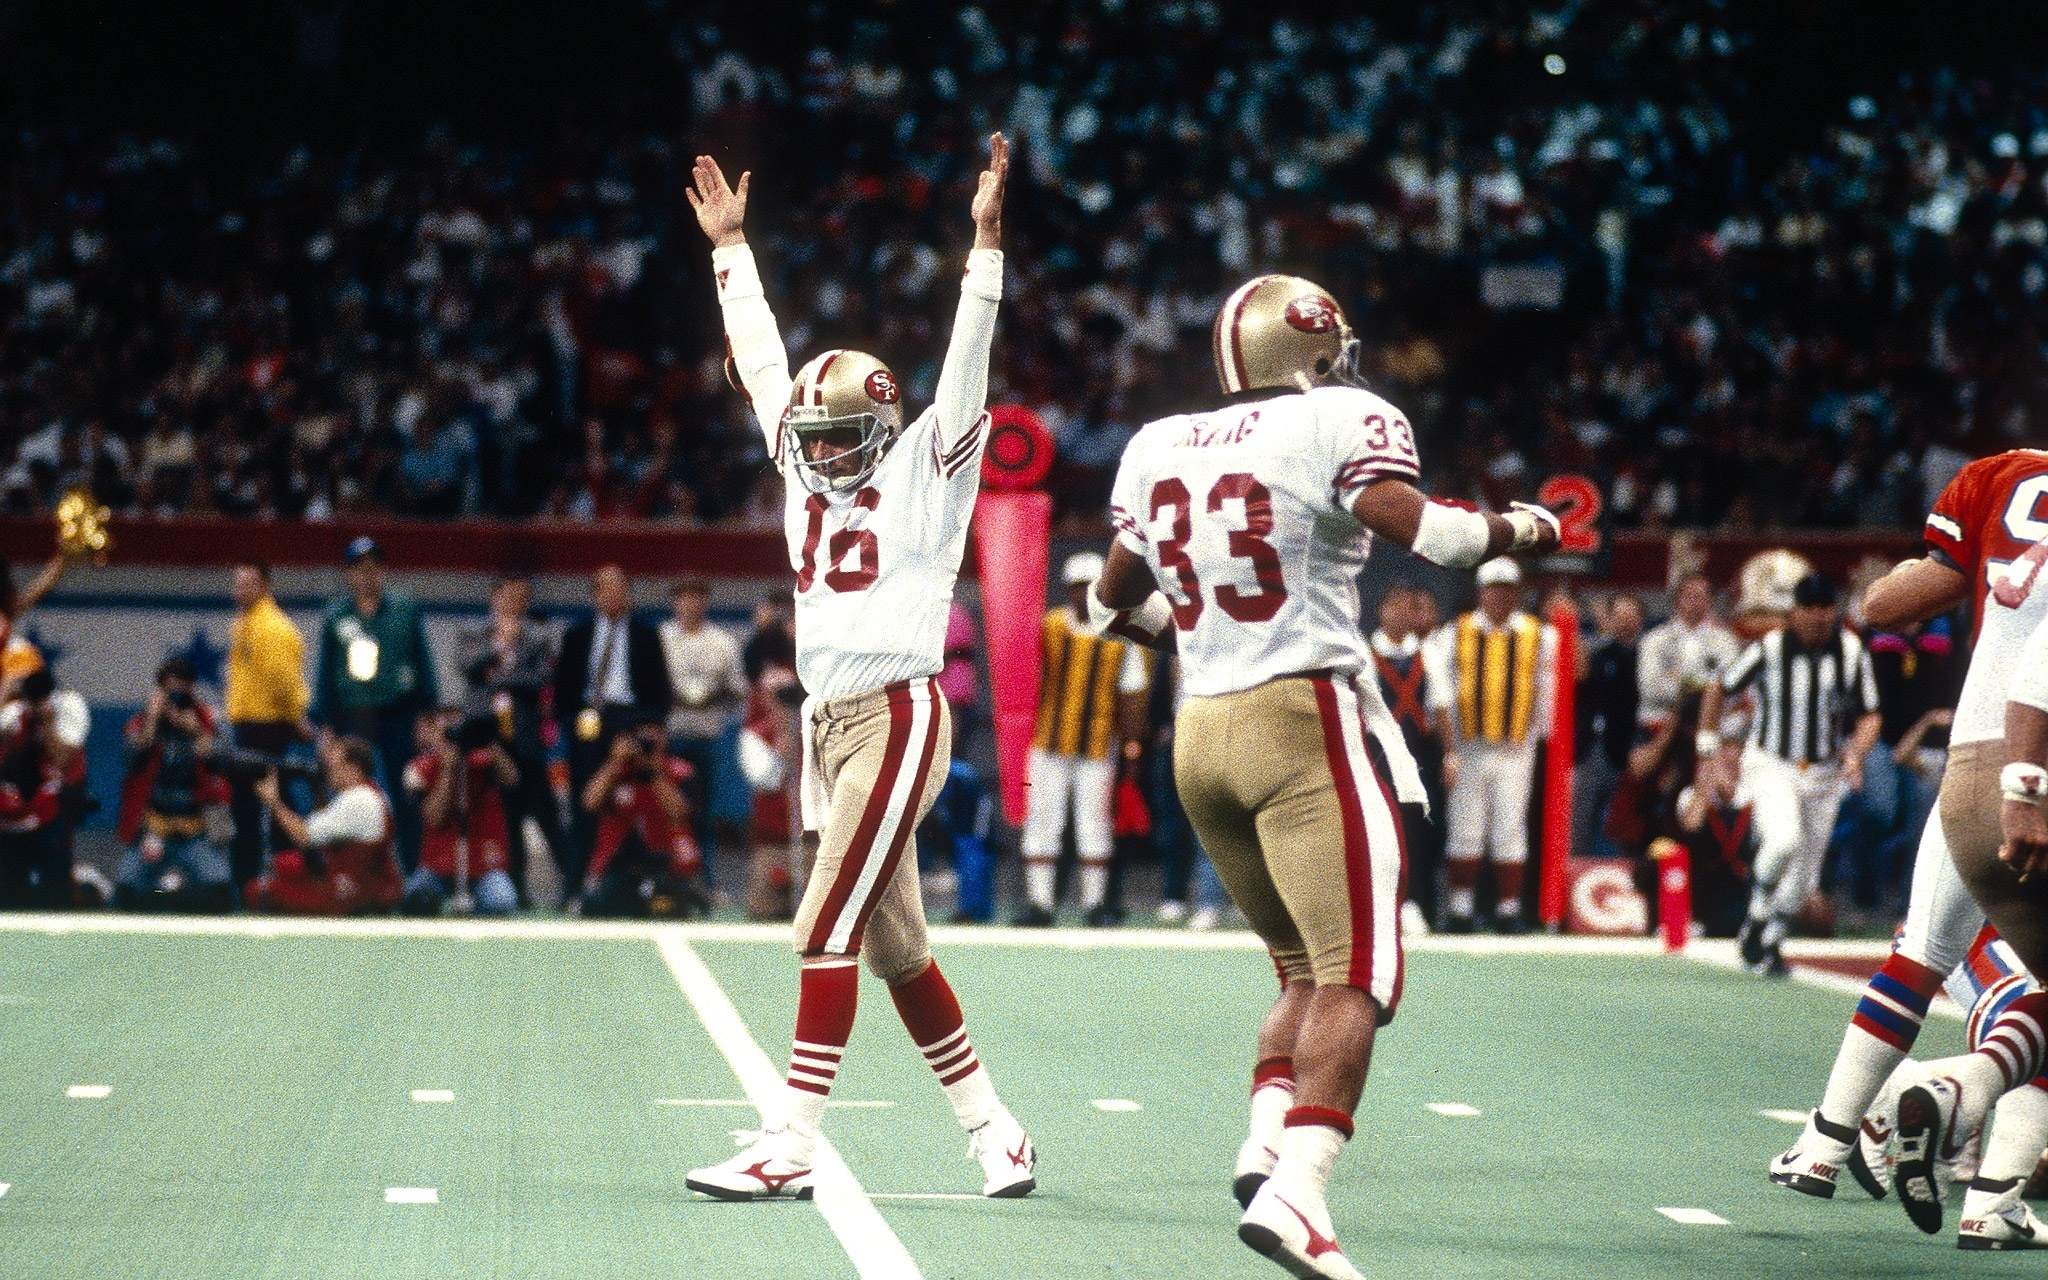 1. Joe Montana - The 48 Greatest Super Bowl Stars - Espn for Joe Montana Super Bowl